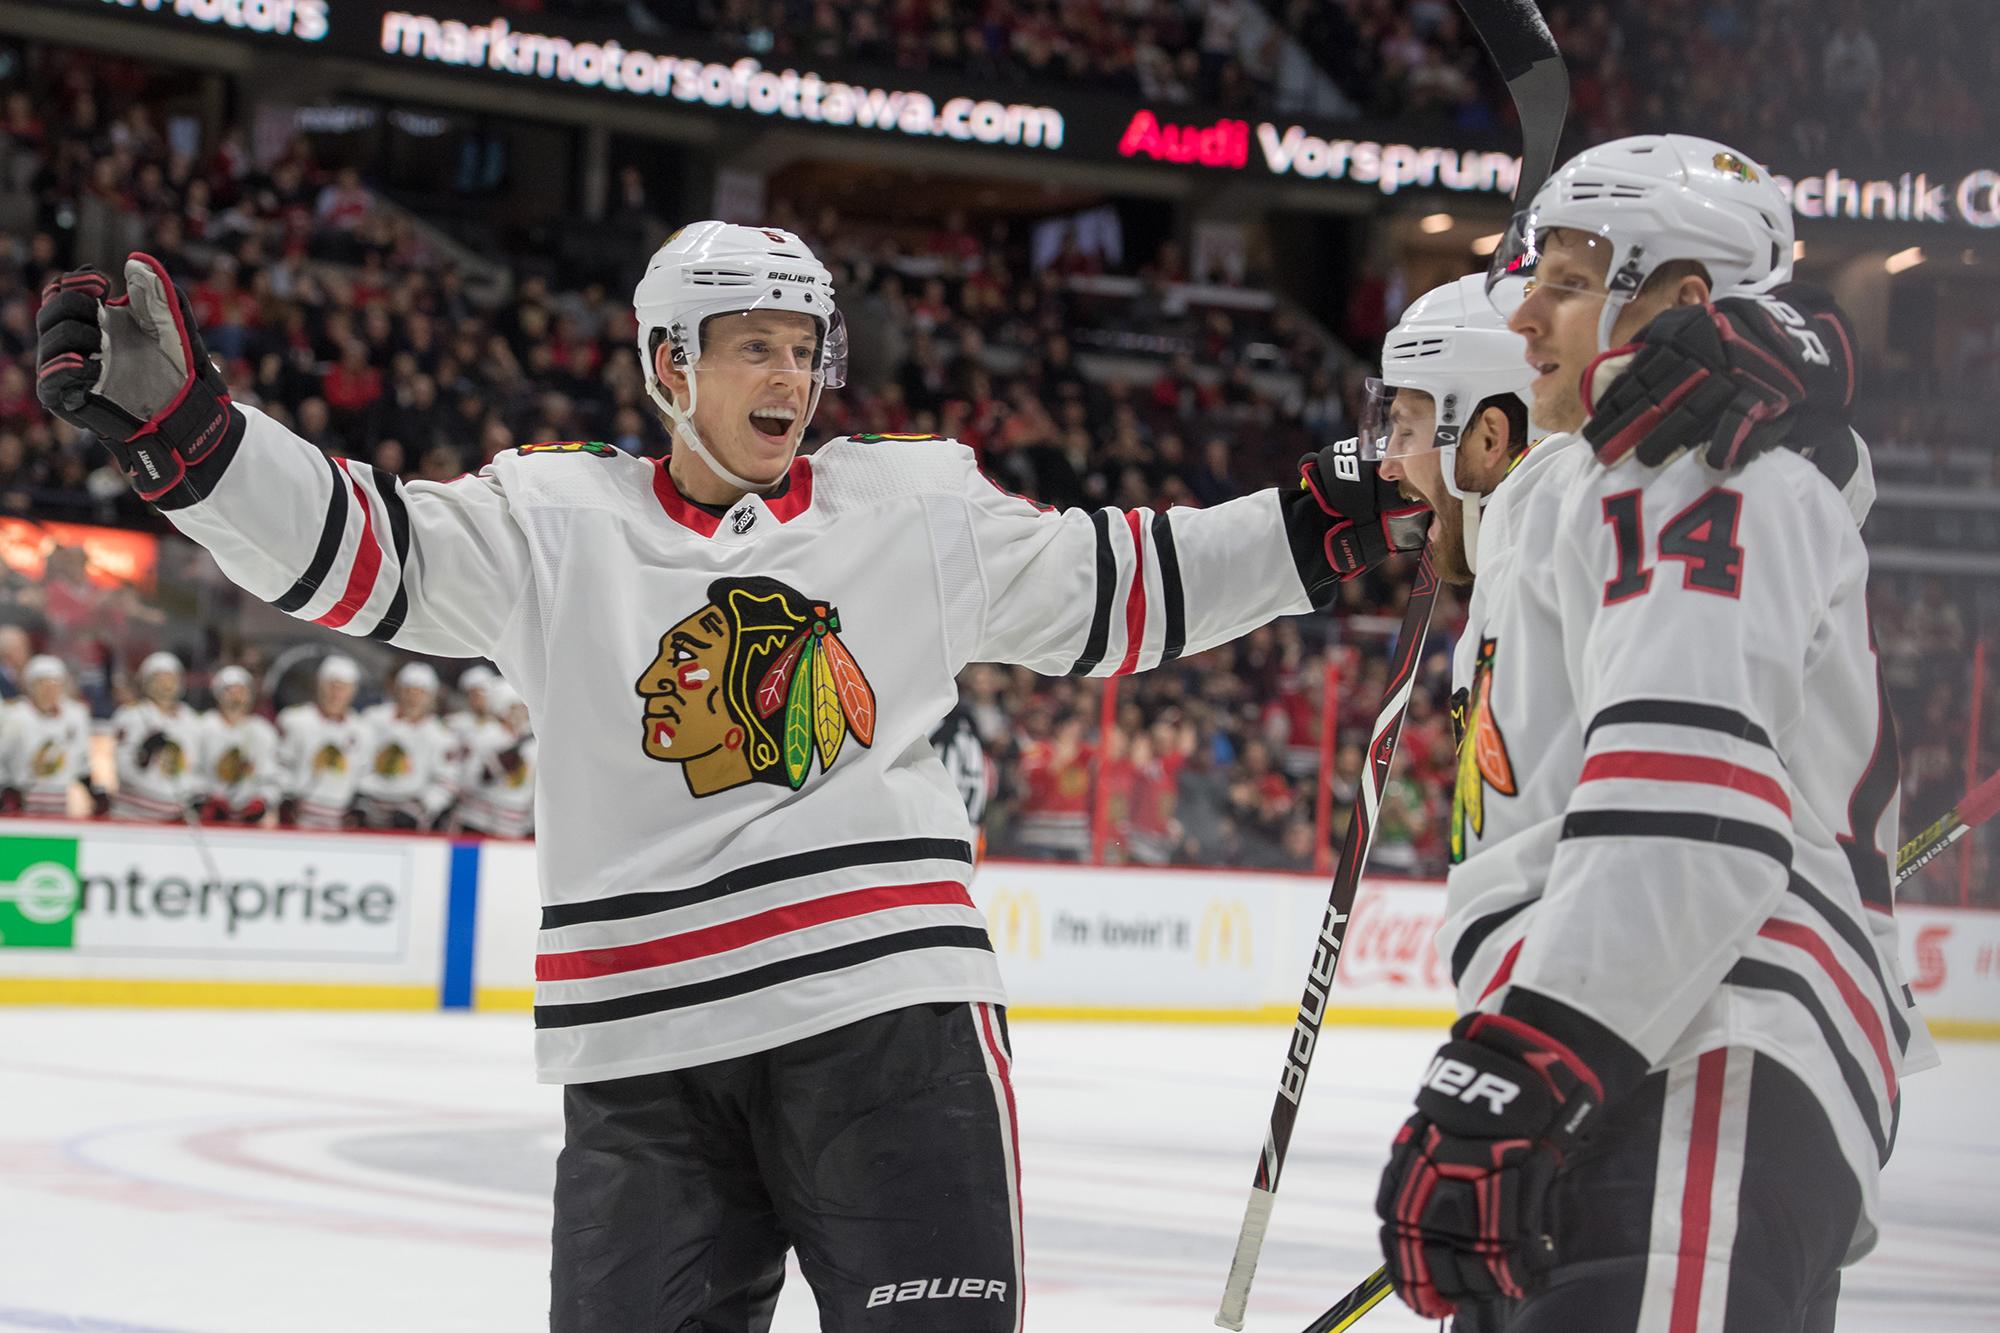 Chicago Blackhawks in decent shape as Crawford nears return